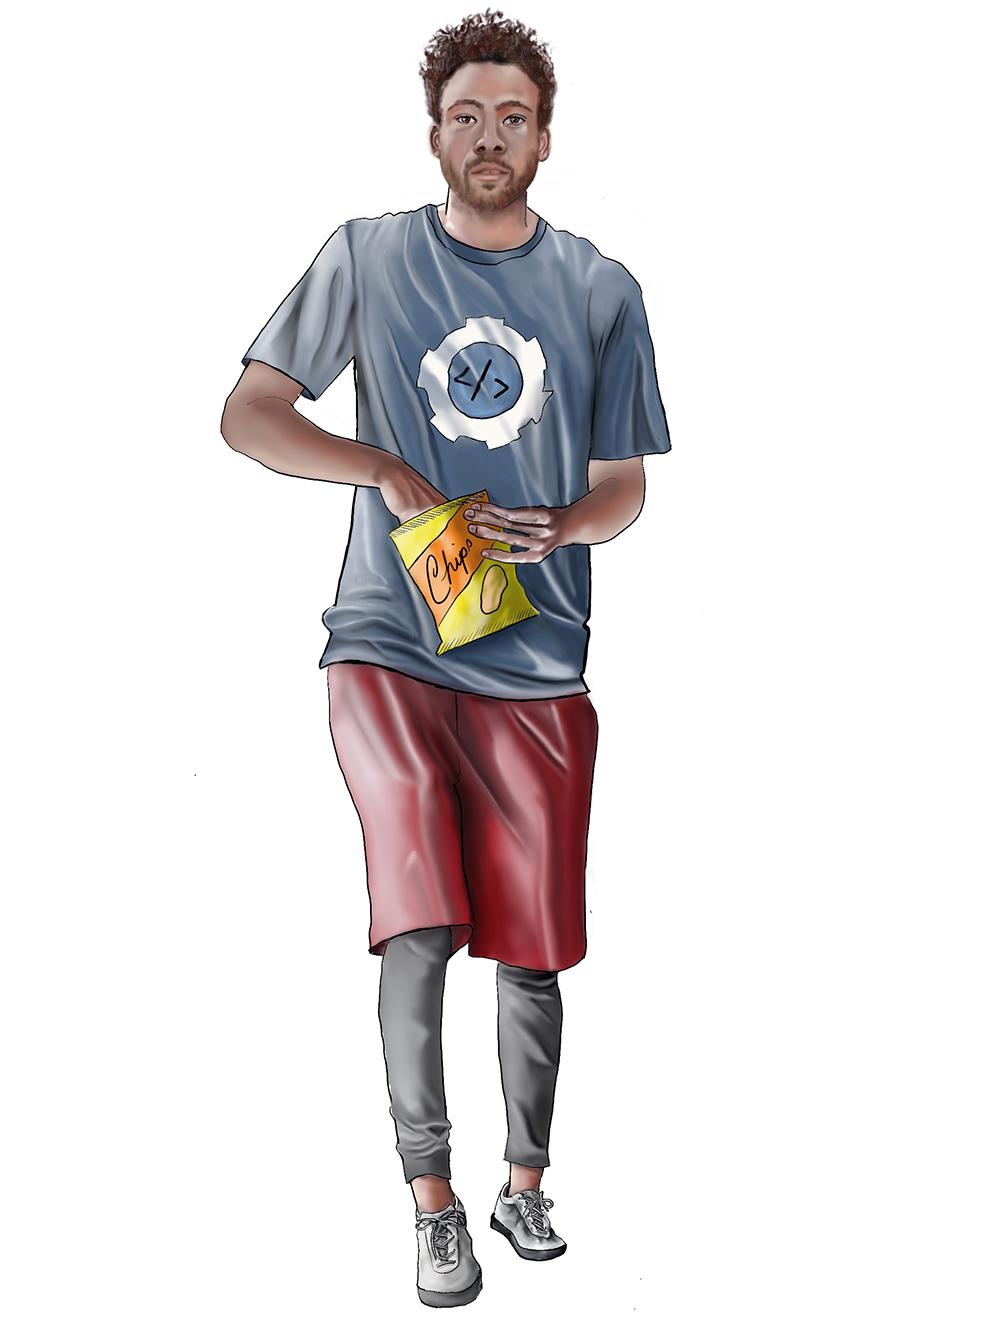 Digital color version of rough draft of the software developer.